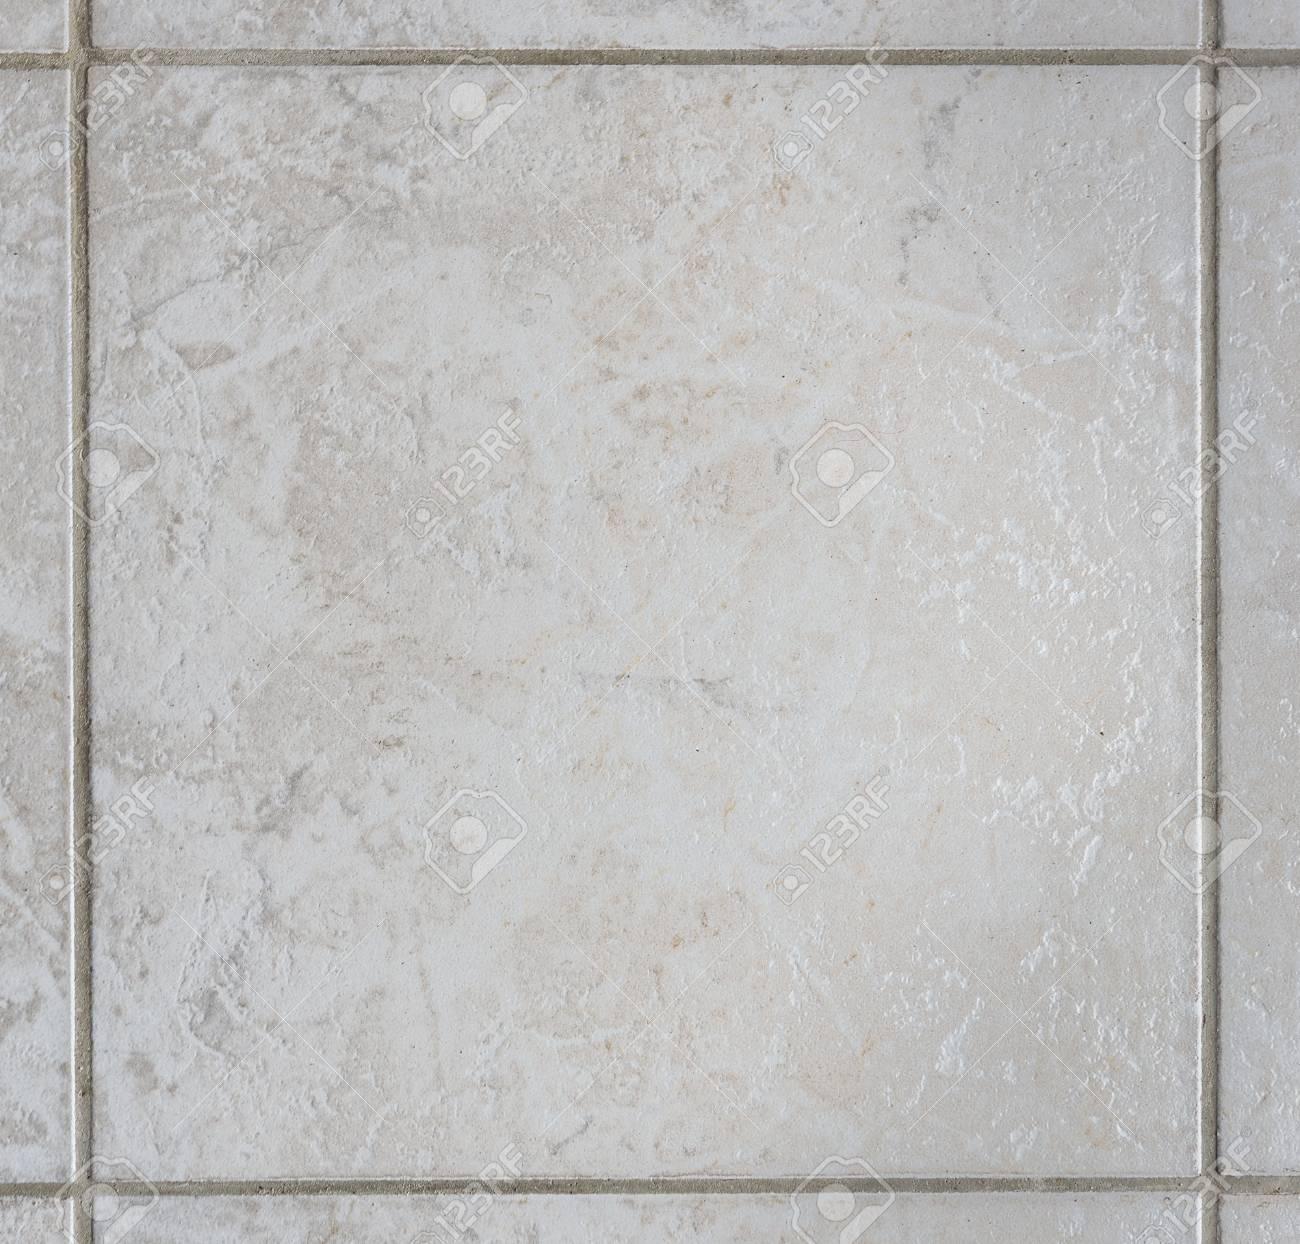 Interior Bathroom Tiles Tiles. Image Of Interior Flooring With ...